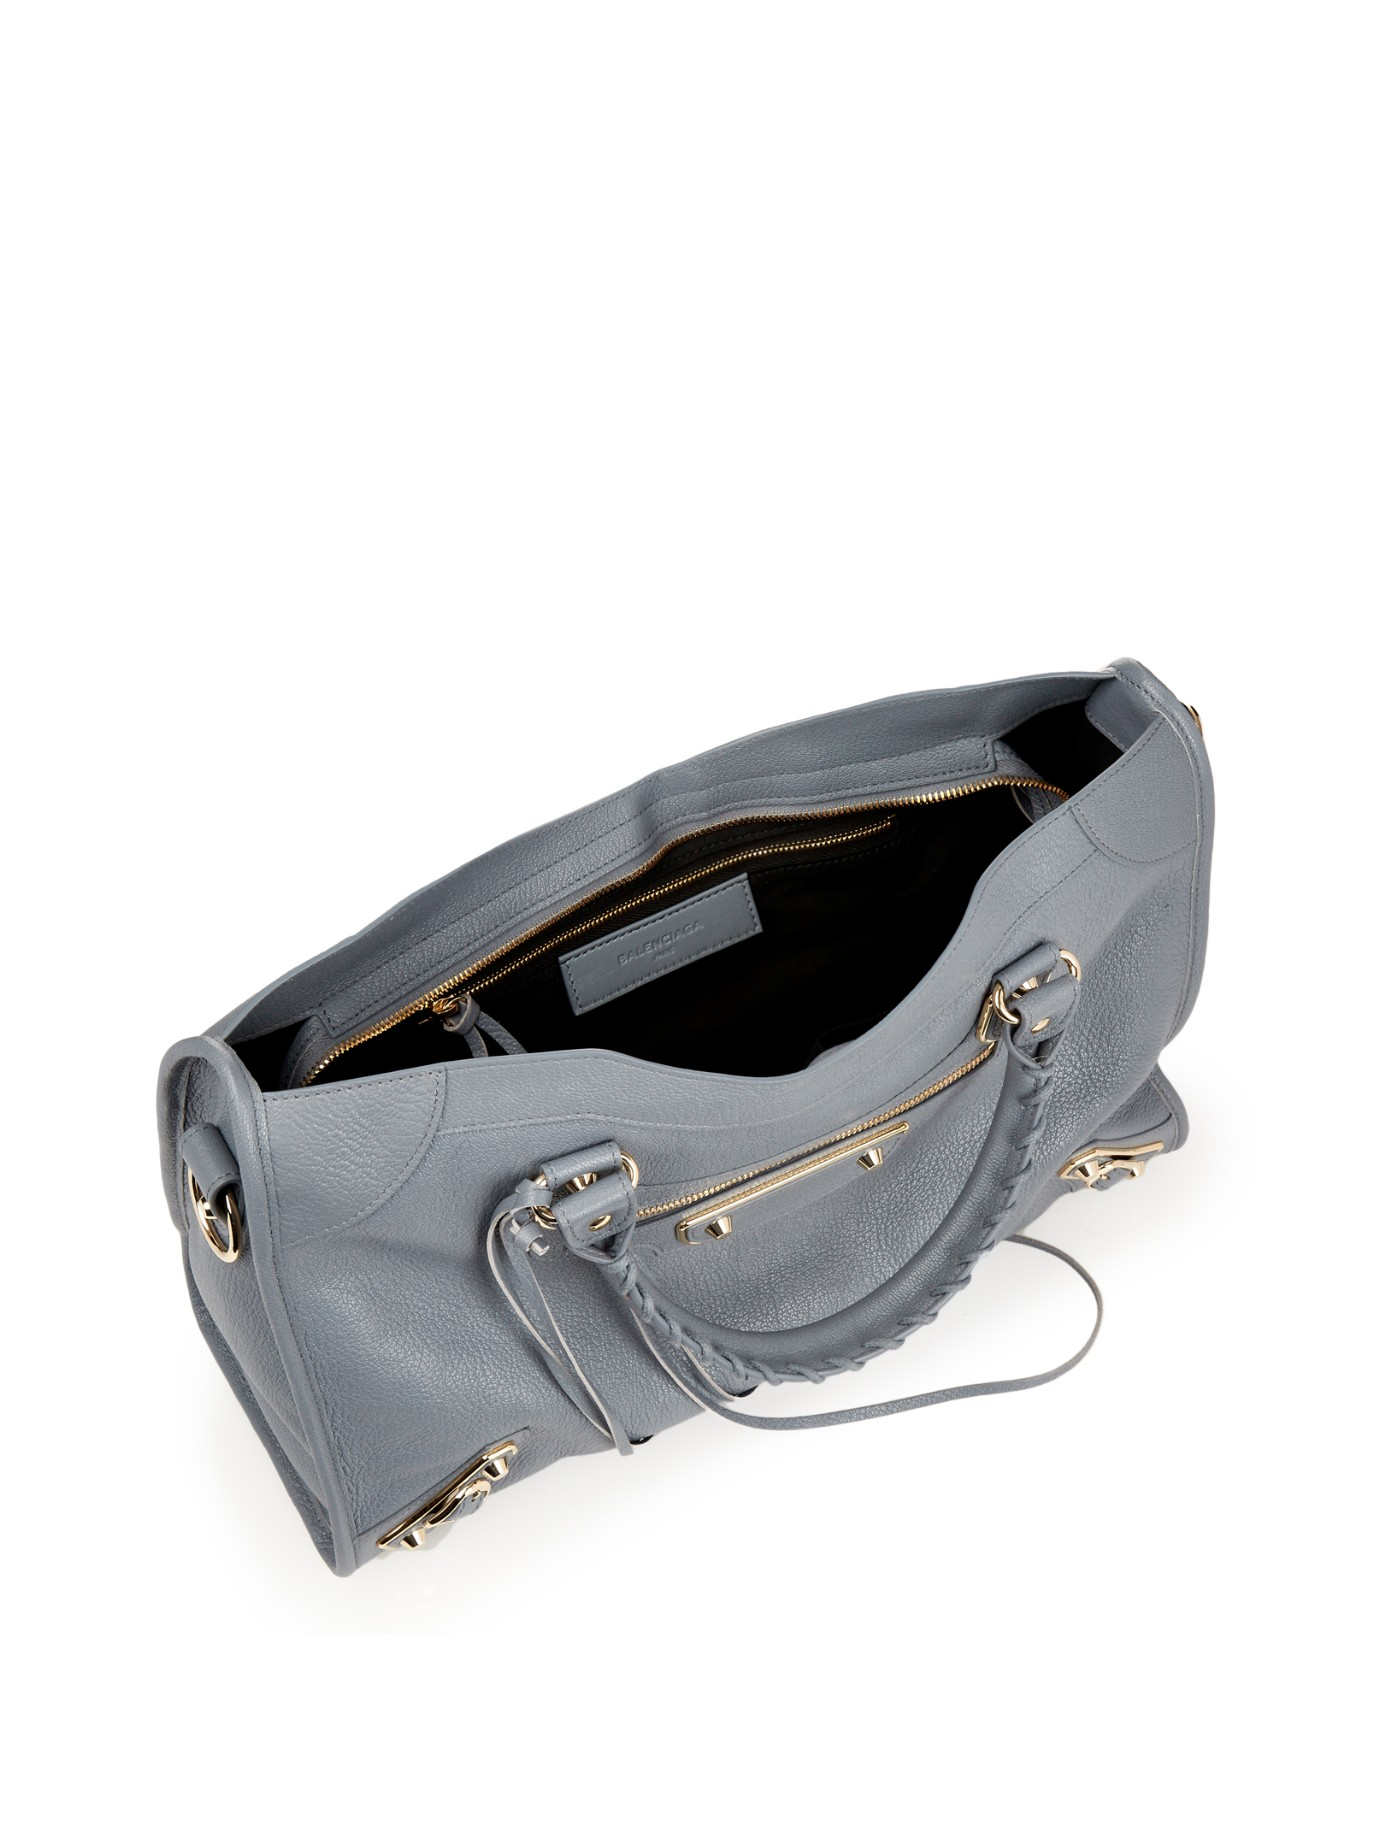 8491ecb3f516 Lyst - Balenciaga Classic City Metallic-edge Leather Tote in Blue